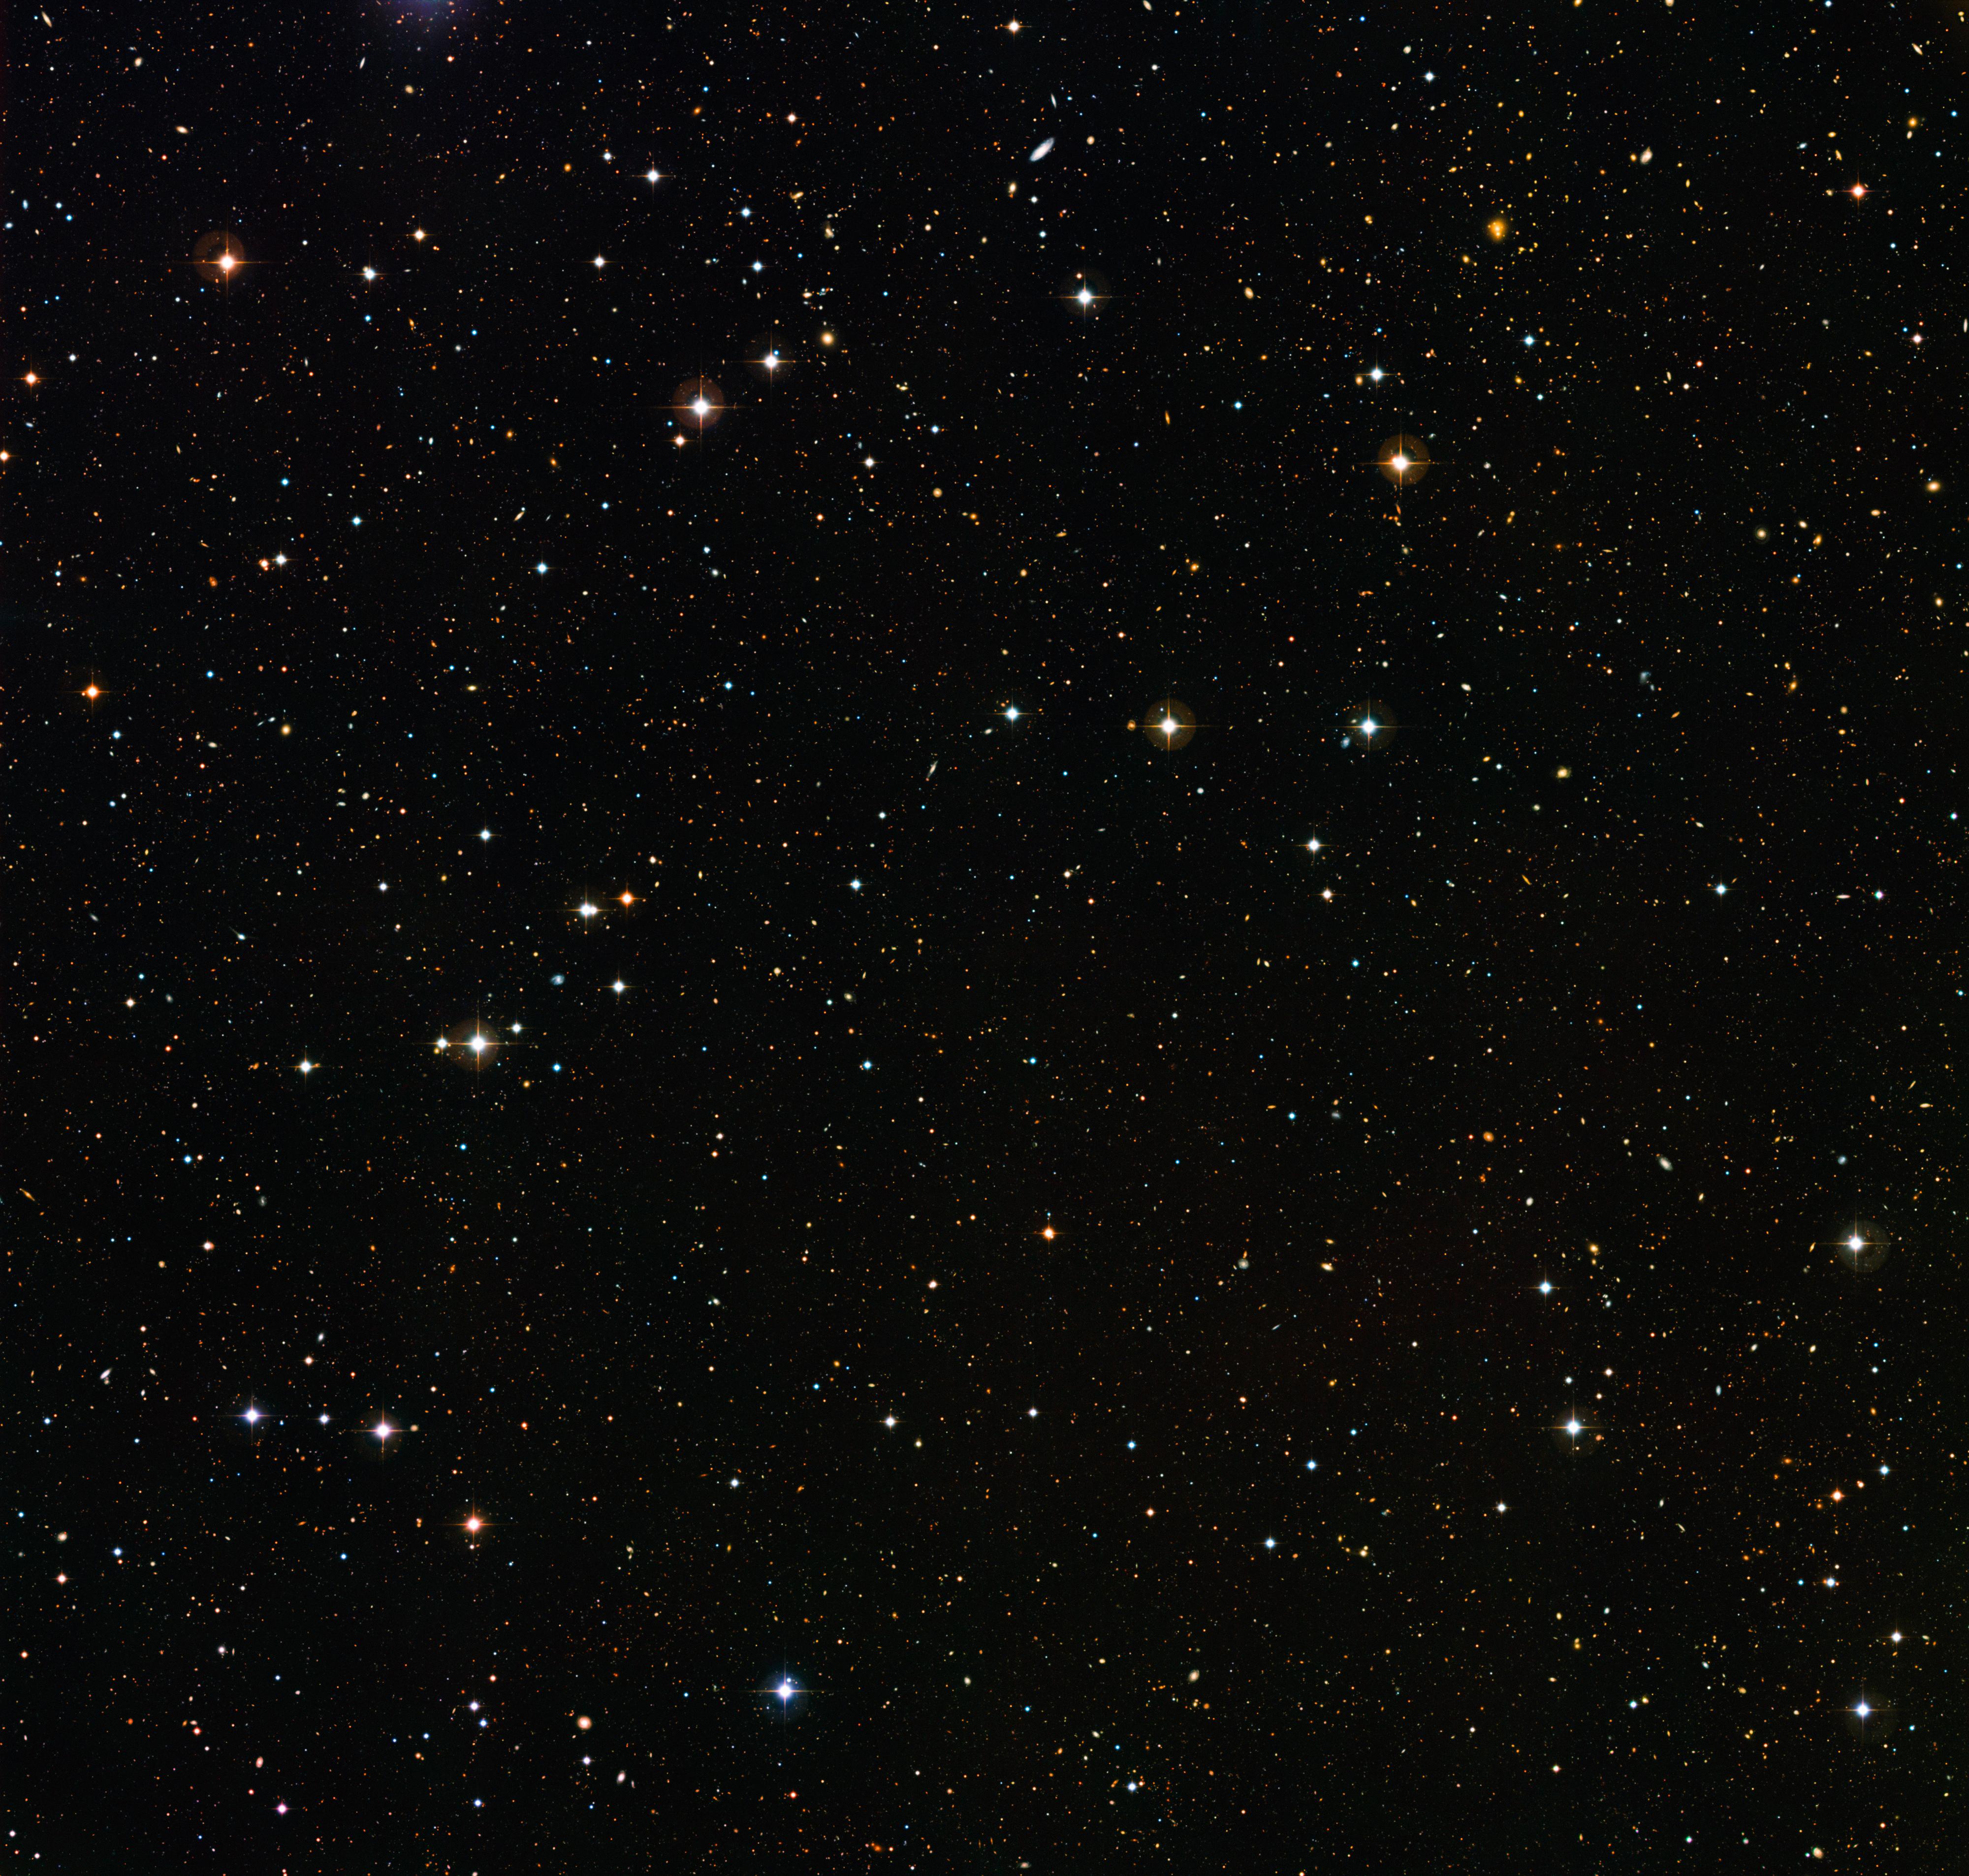 File:A Deep Look into a Dark Sky.jpg - Wikimedia Commons